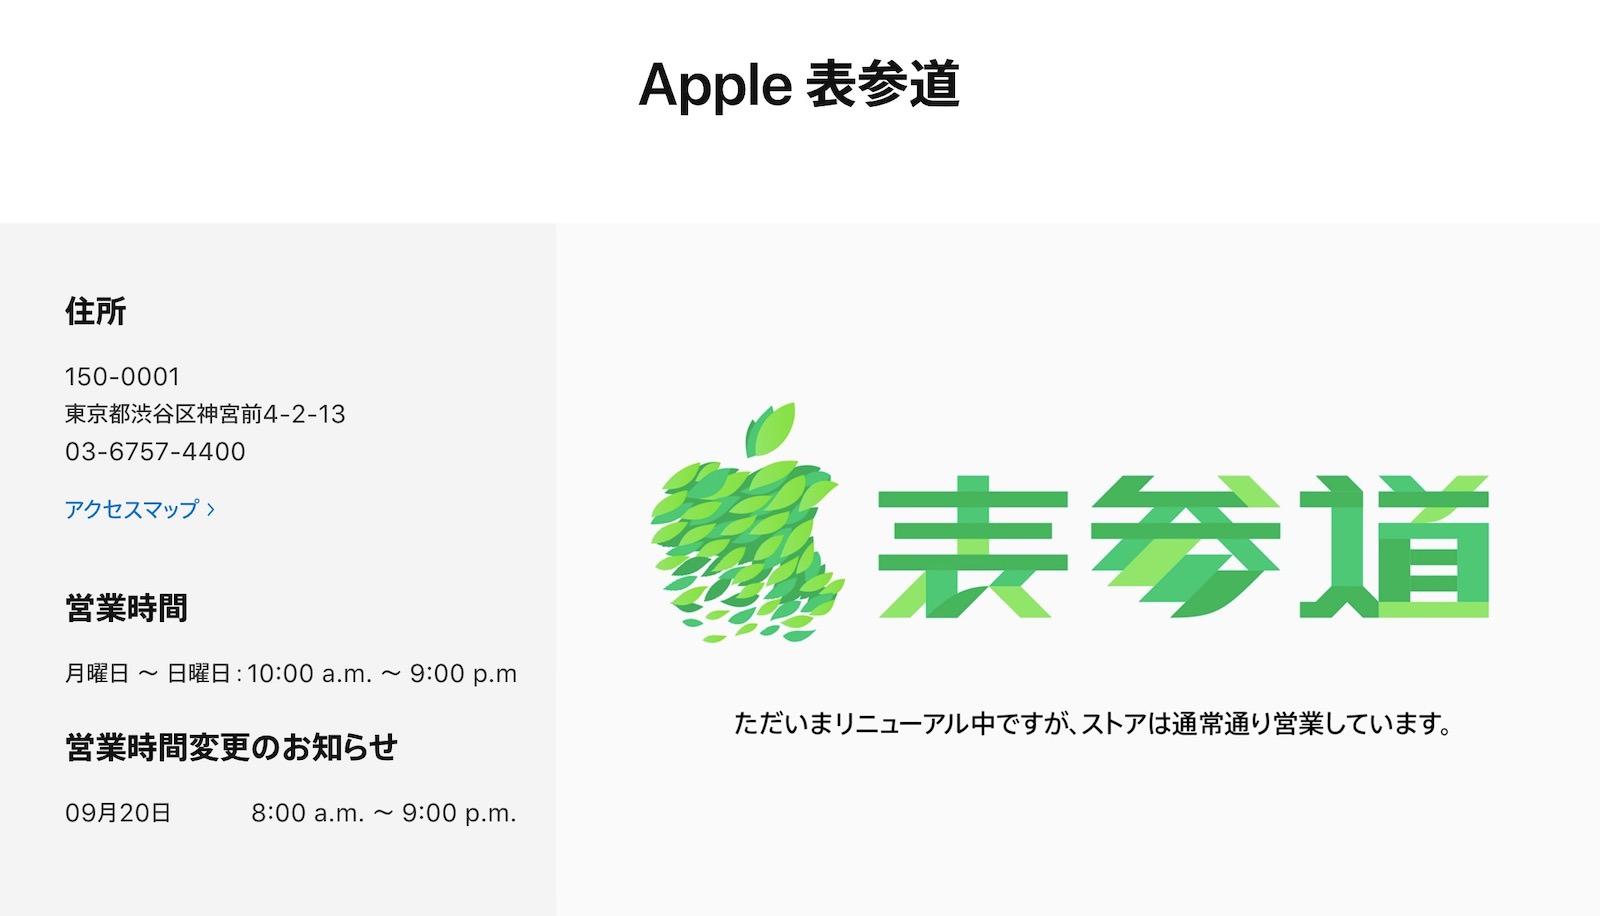 Apple-Omotesando-sep20-opens-early.jpg